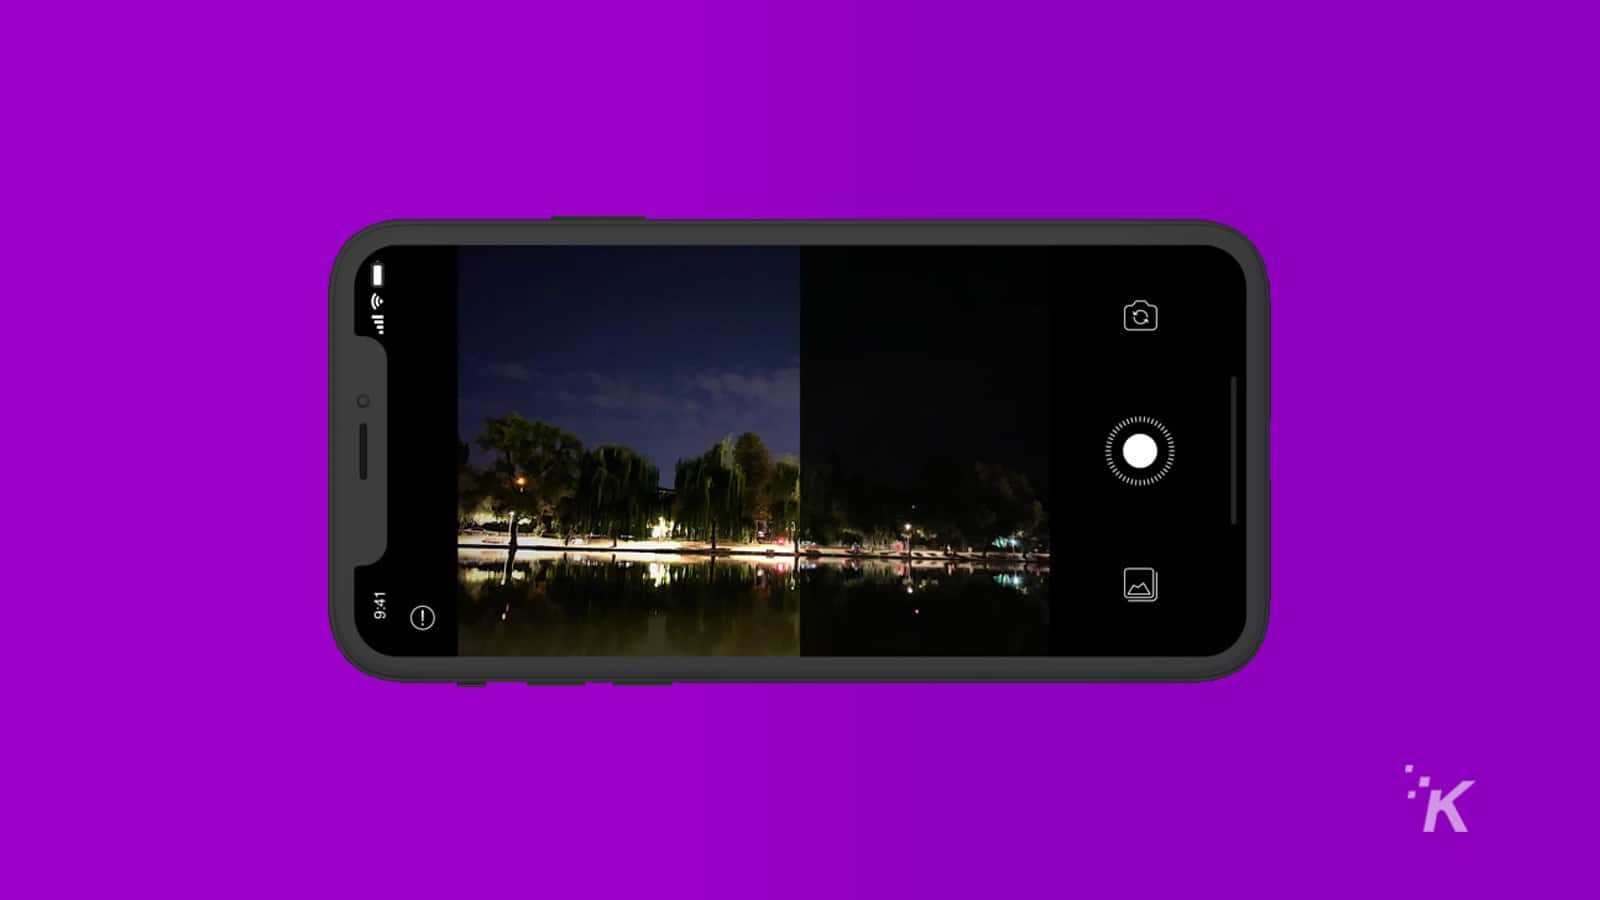 neuralcam night mode camera